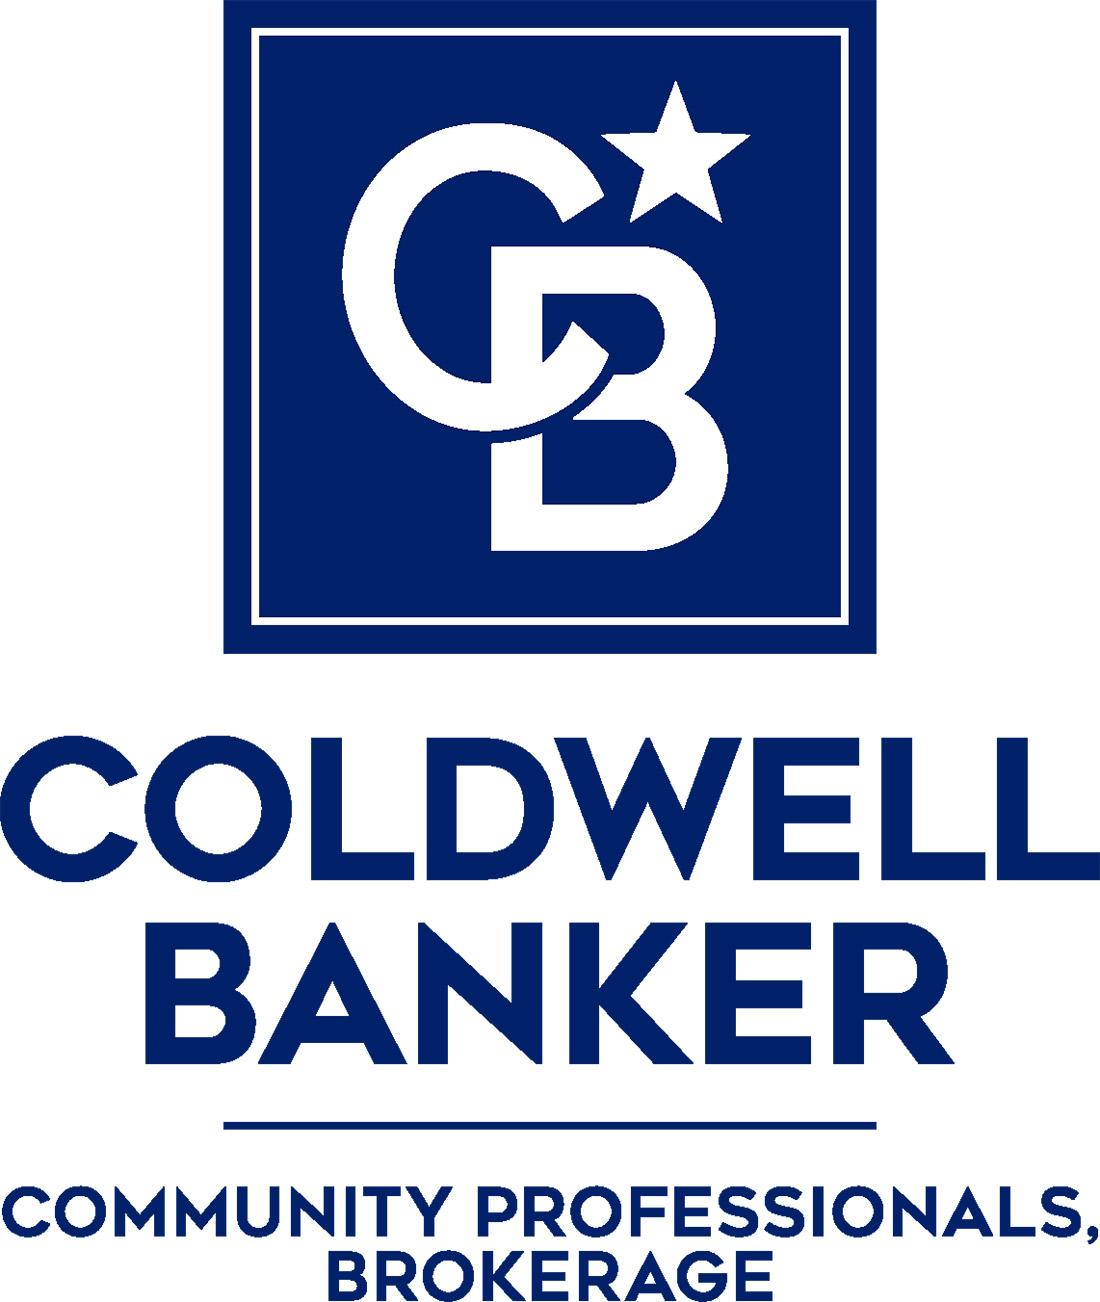 Natalie Hashka - Coldwell Banker Community Professionals Logo